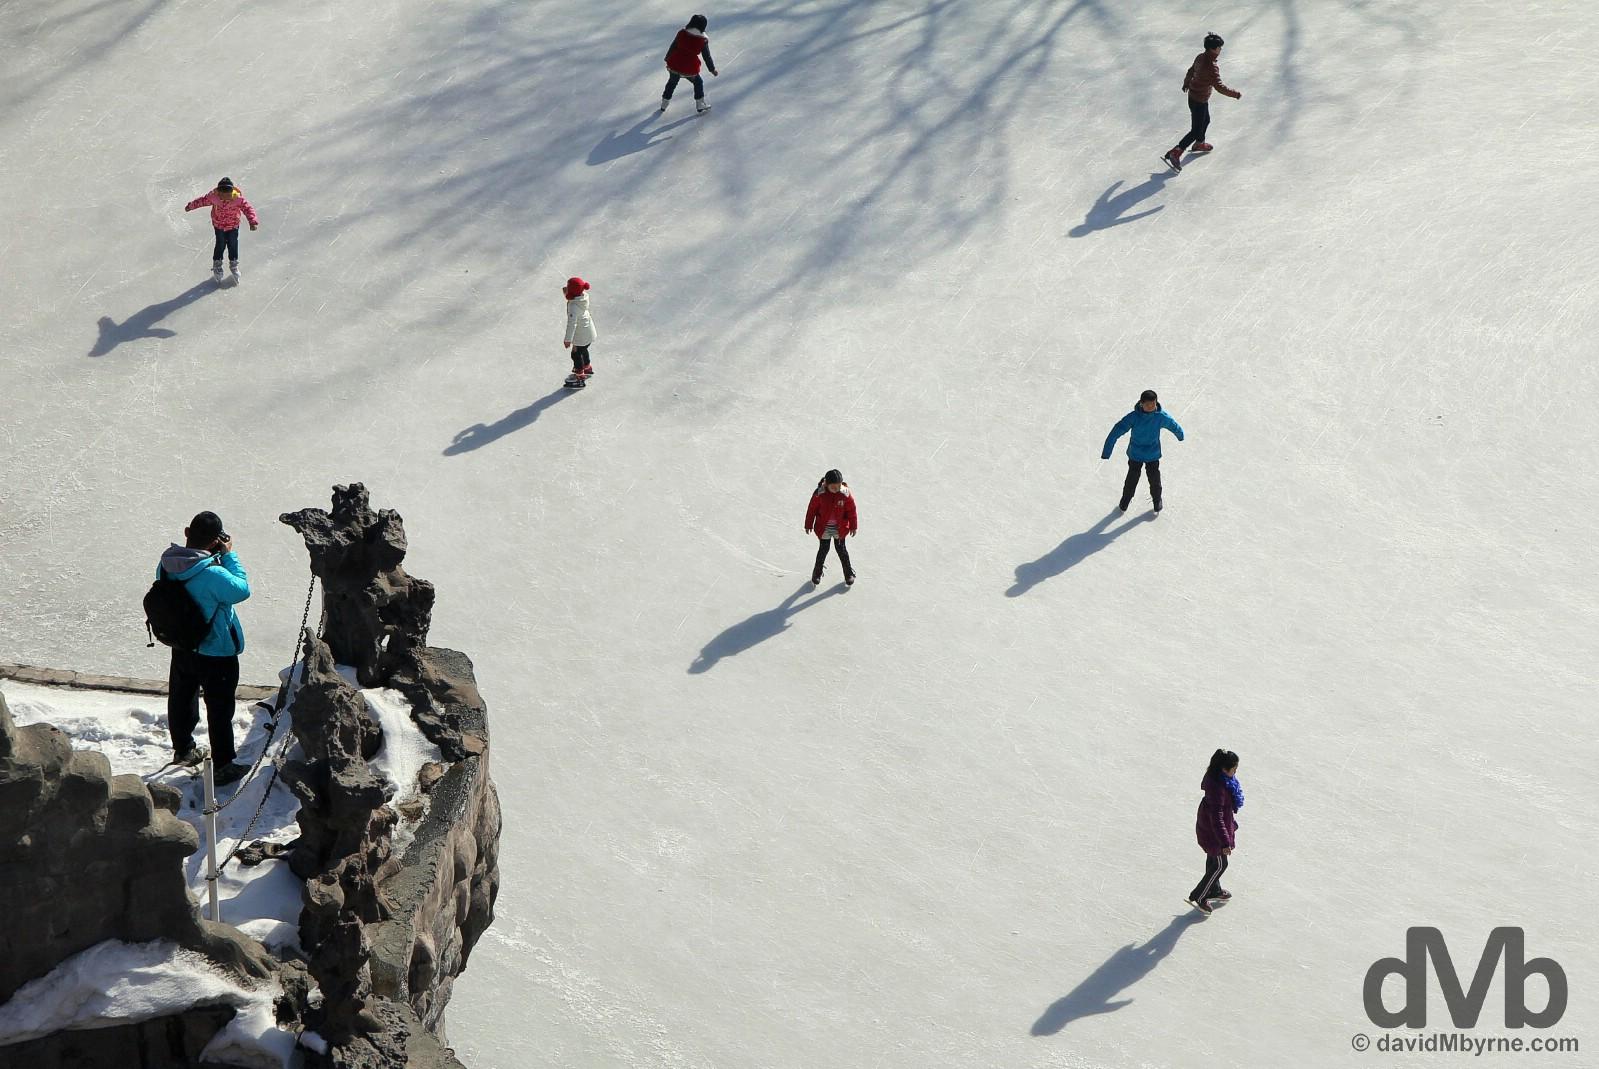 Overlooking skaters in Hongshan (Red Hill) Park, Urumqi, northwestern China. February 11, 2015.